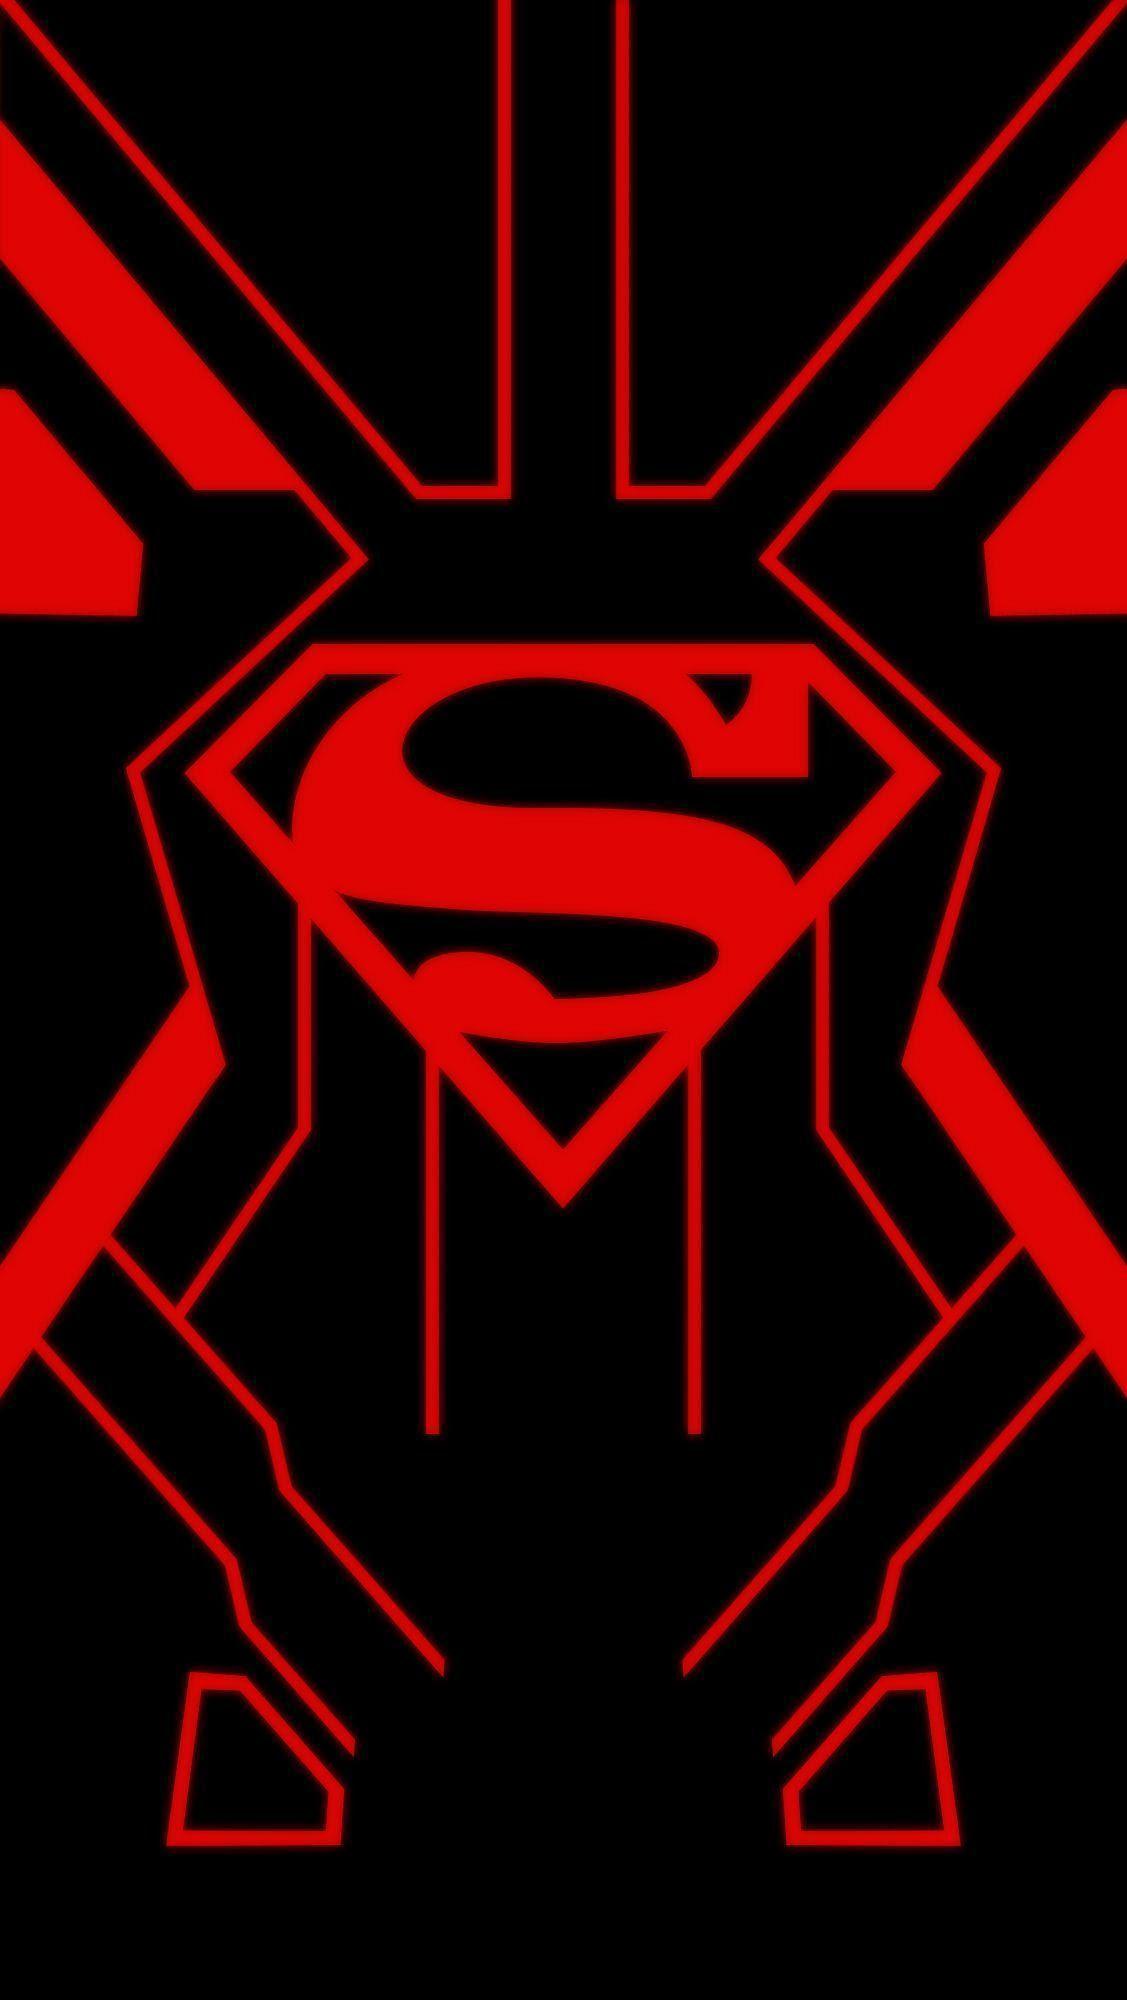 Superboy Wallpapers - Wallpaper Cave